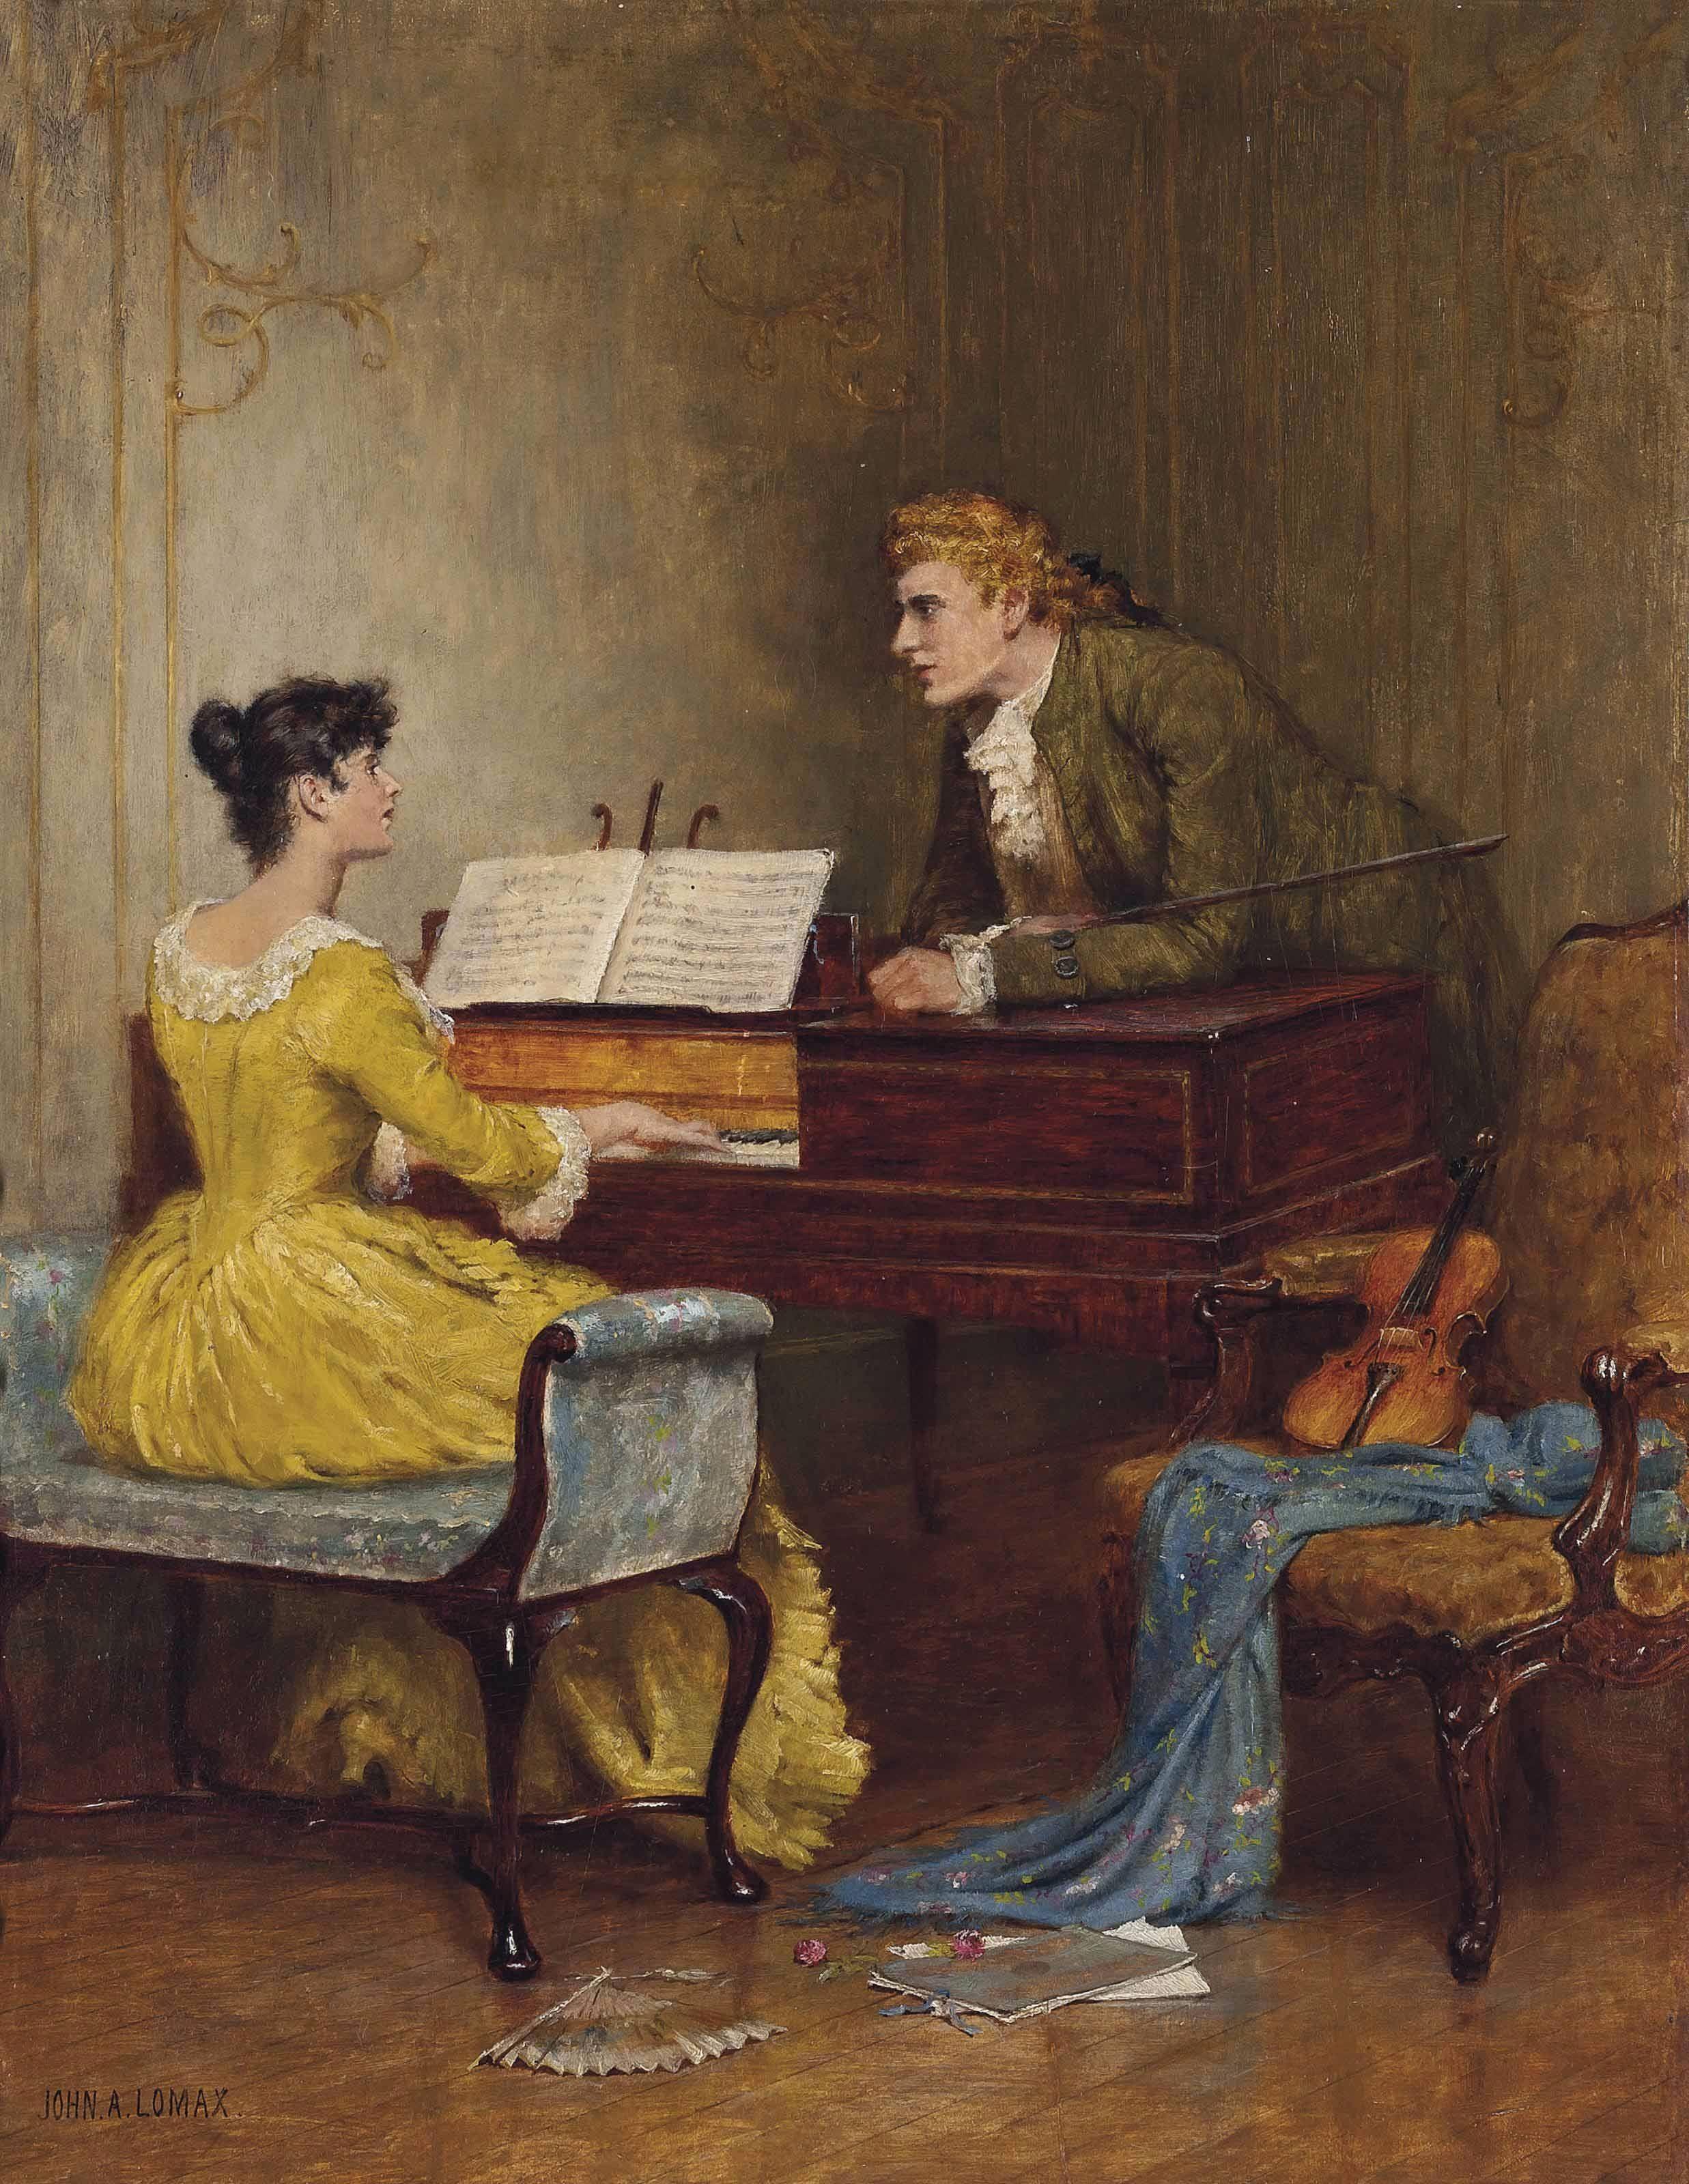 A Musical Interlude By John Arthur Lomax 1857 1923 Art Romantic Art Classic Art